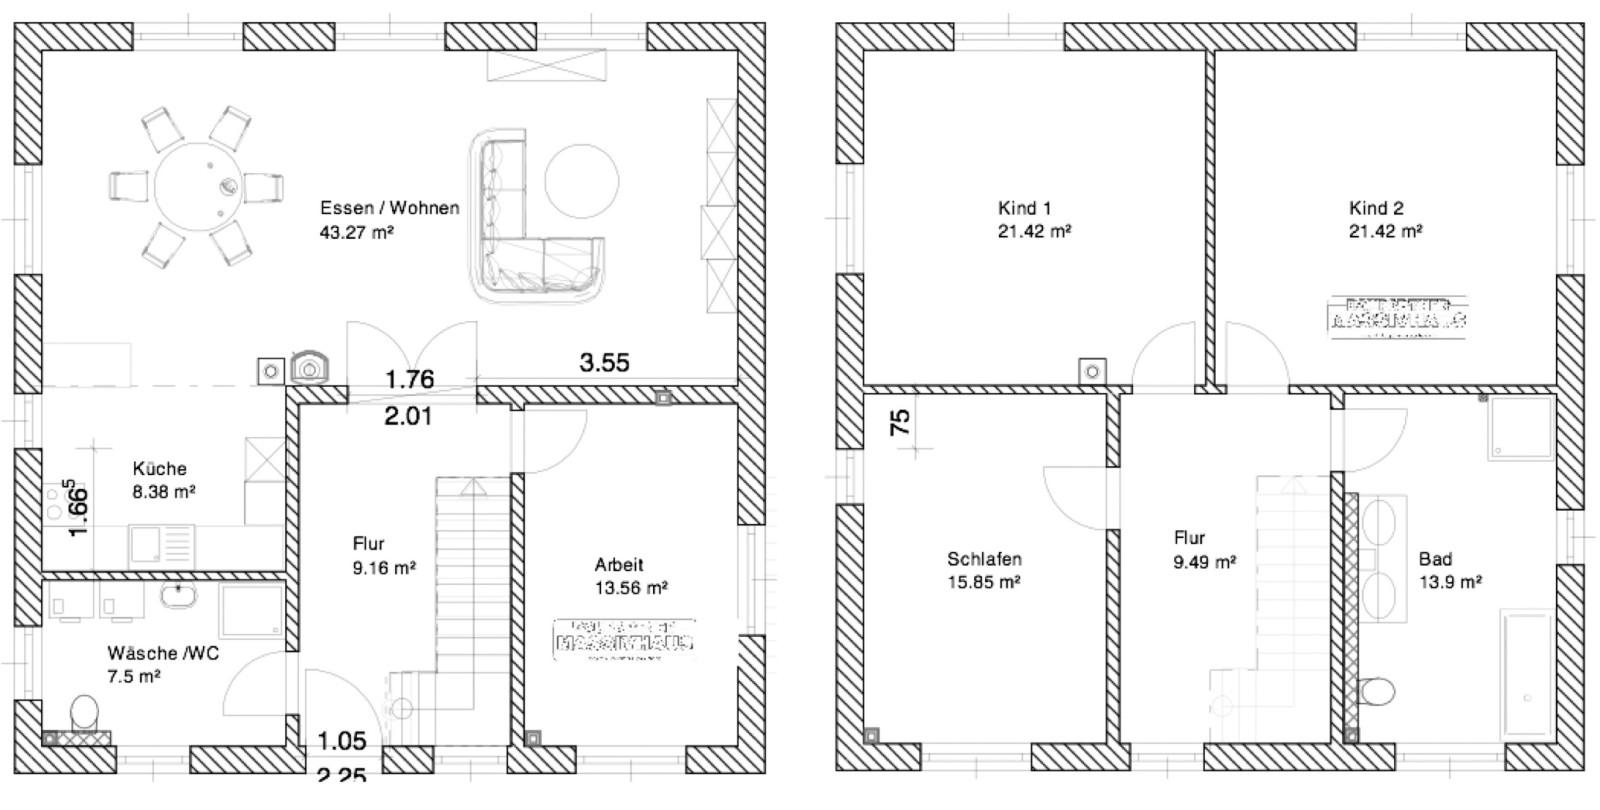 Grundriss stadtvilla 140 qm  Stadtvilla Katrin-Langewiesen ca. 164 m² - MHV Baupartner Massivhaus